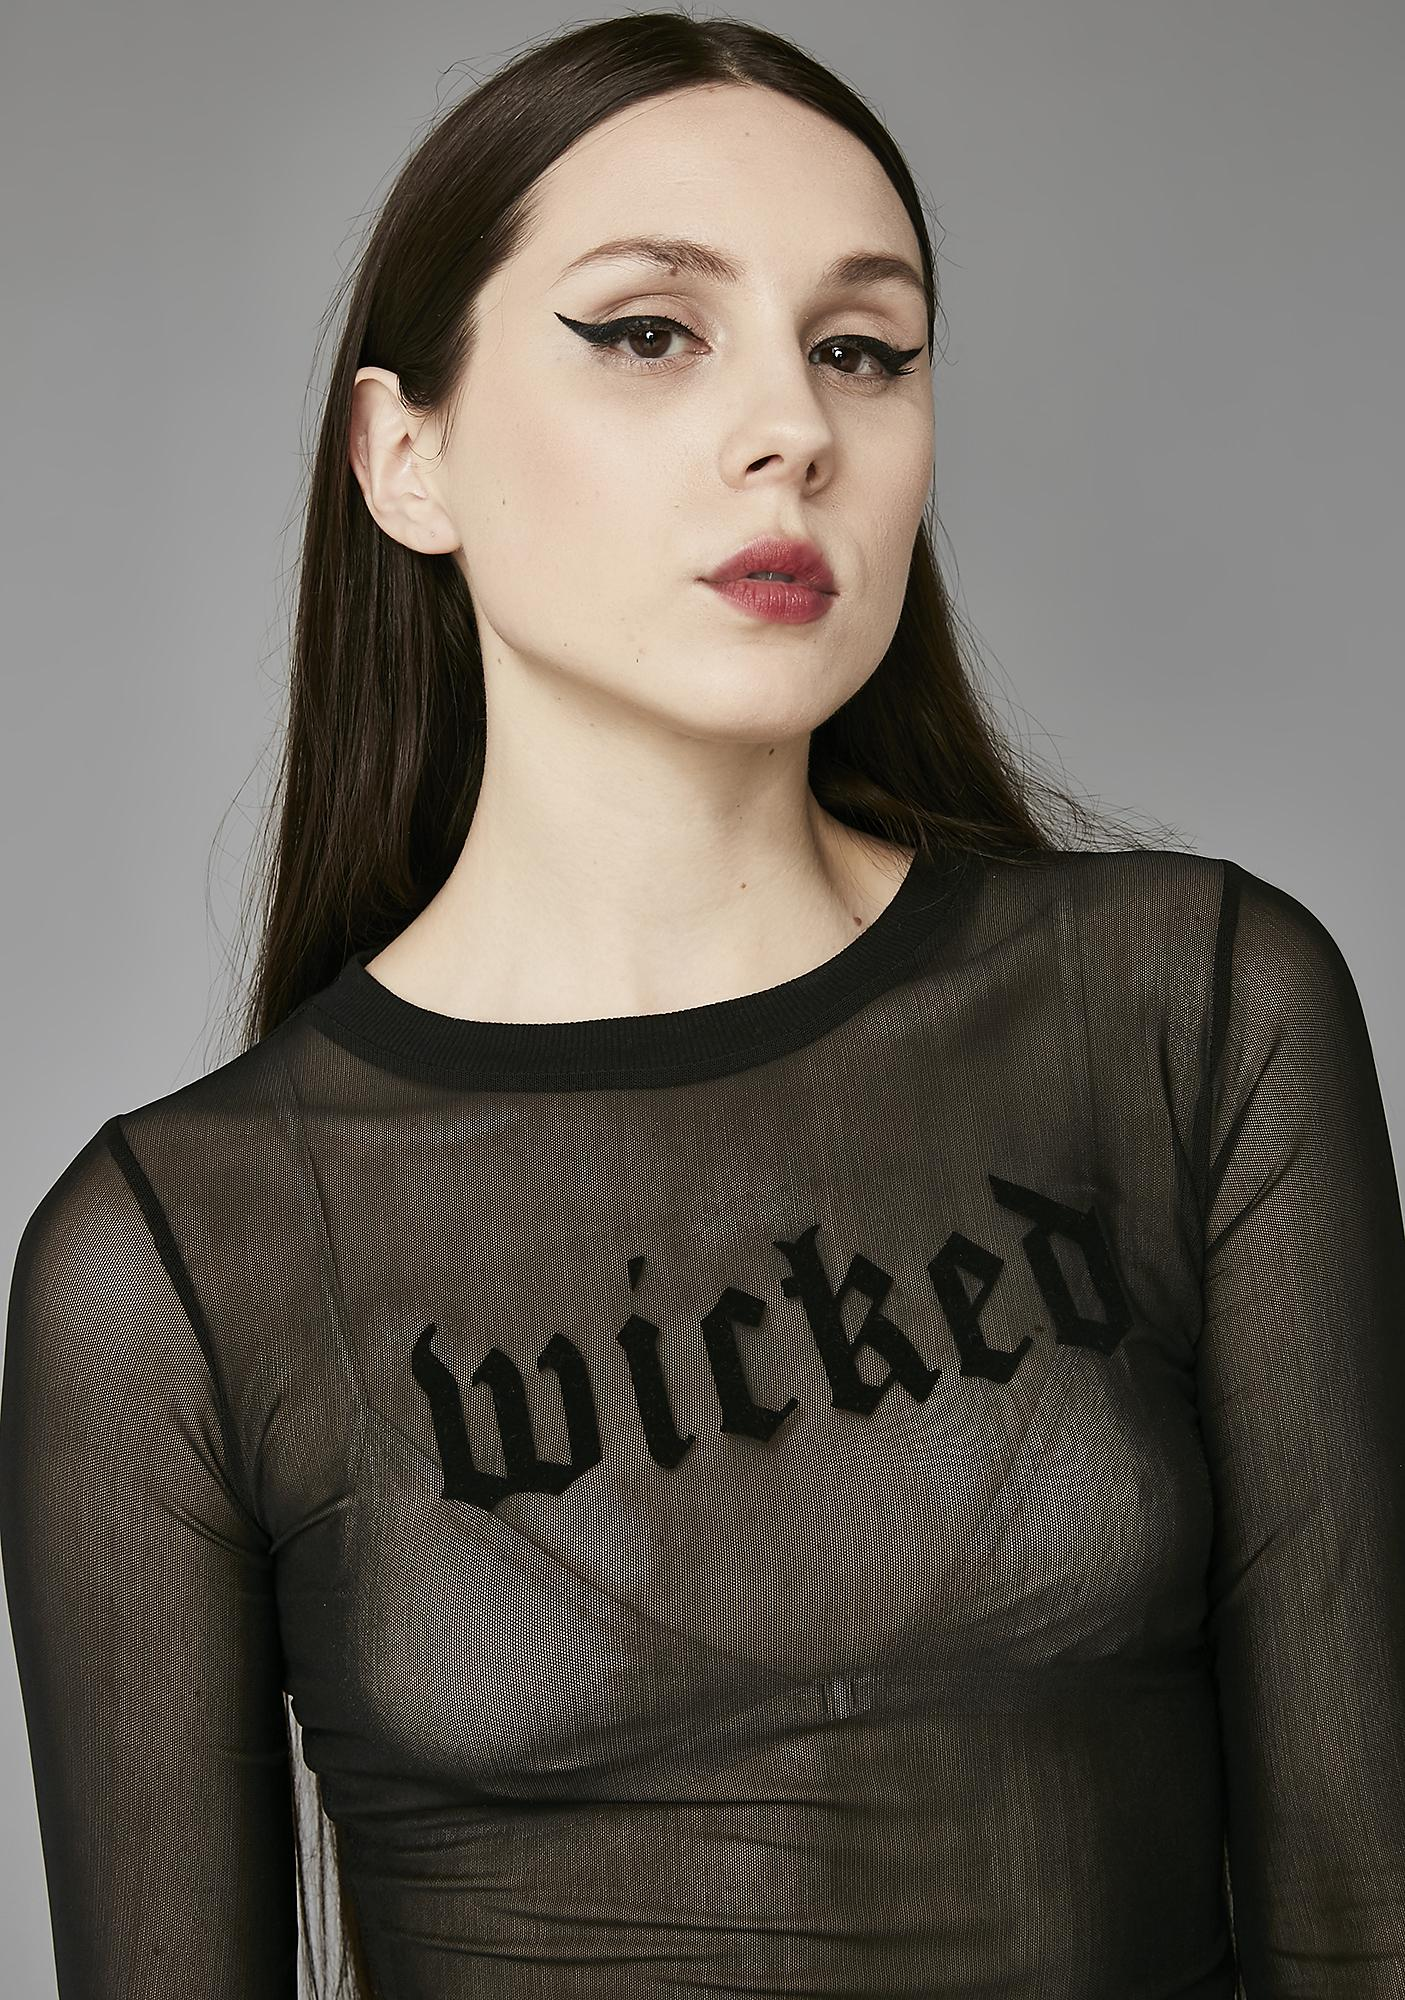 Widow Wicked Mesh Long Sleeve Tee